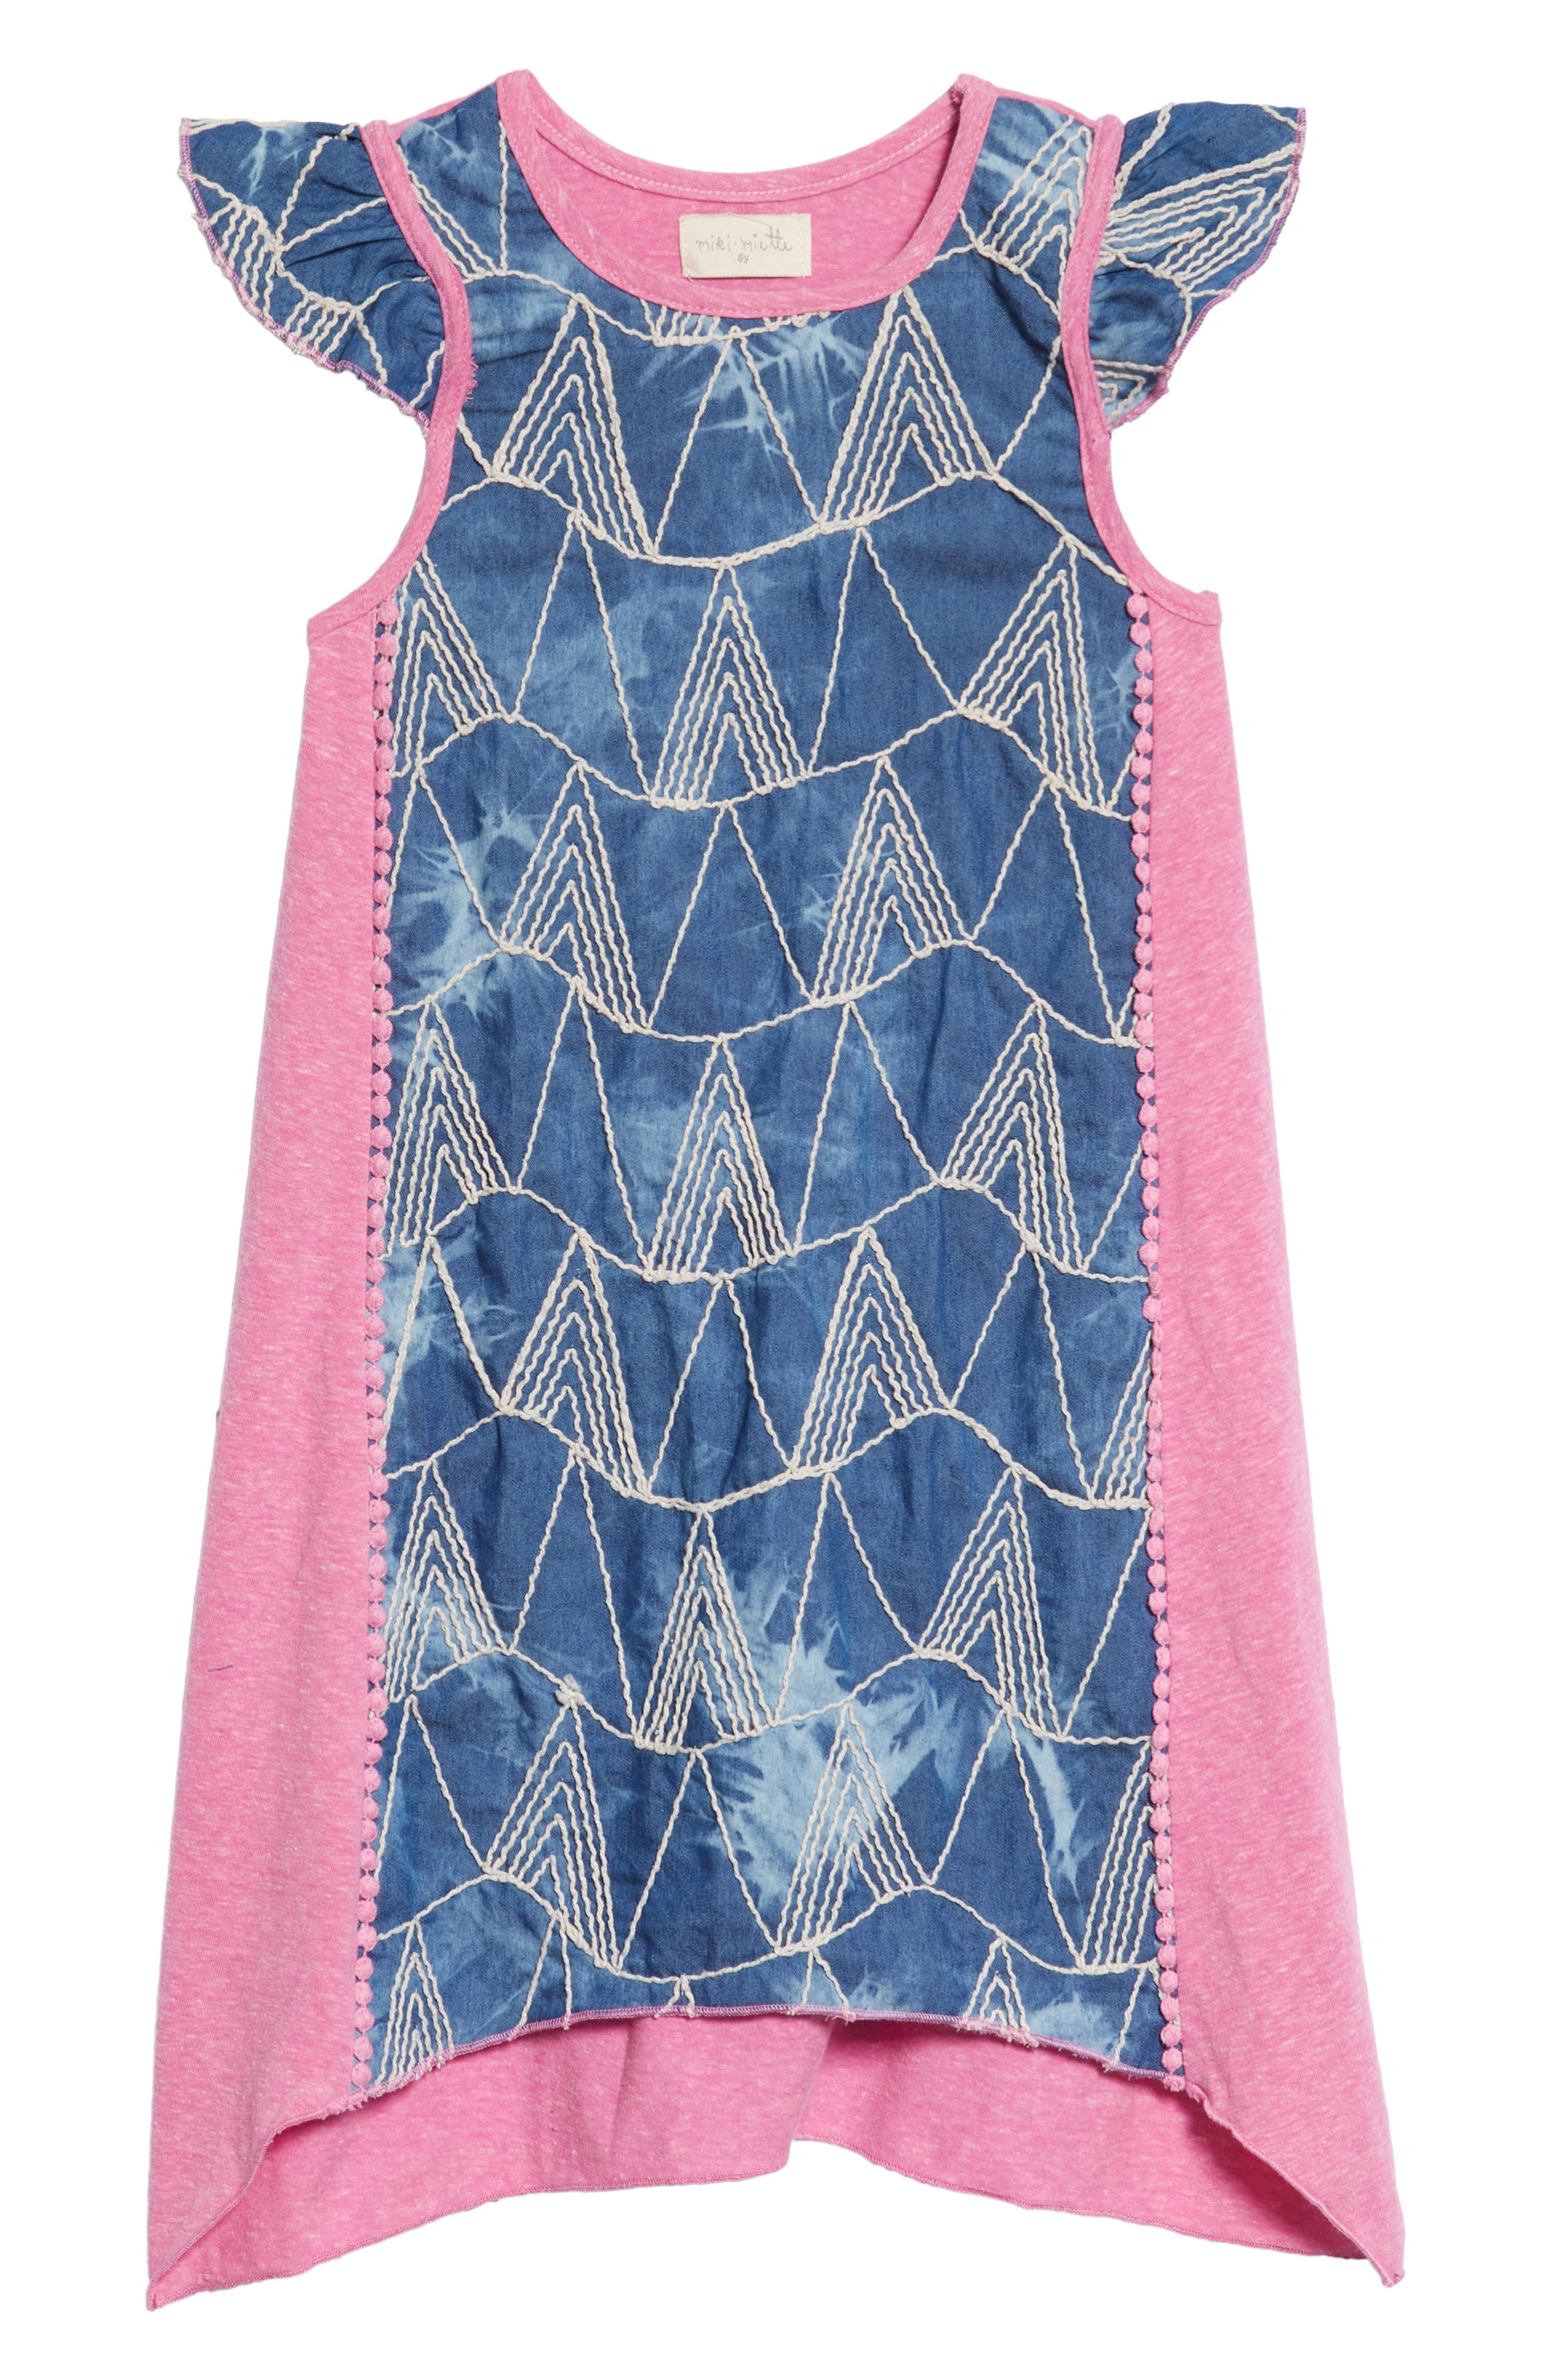 Main Image - Mikki Miette India Embroidered Dress (Toddler Girls & Little Girls)